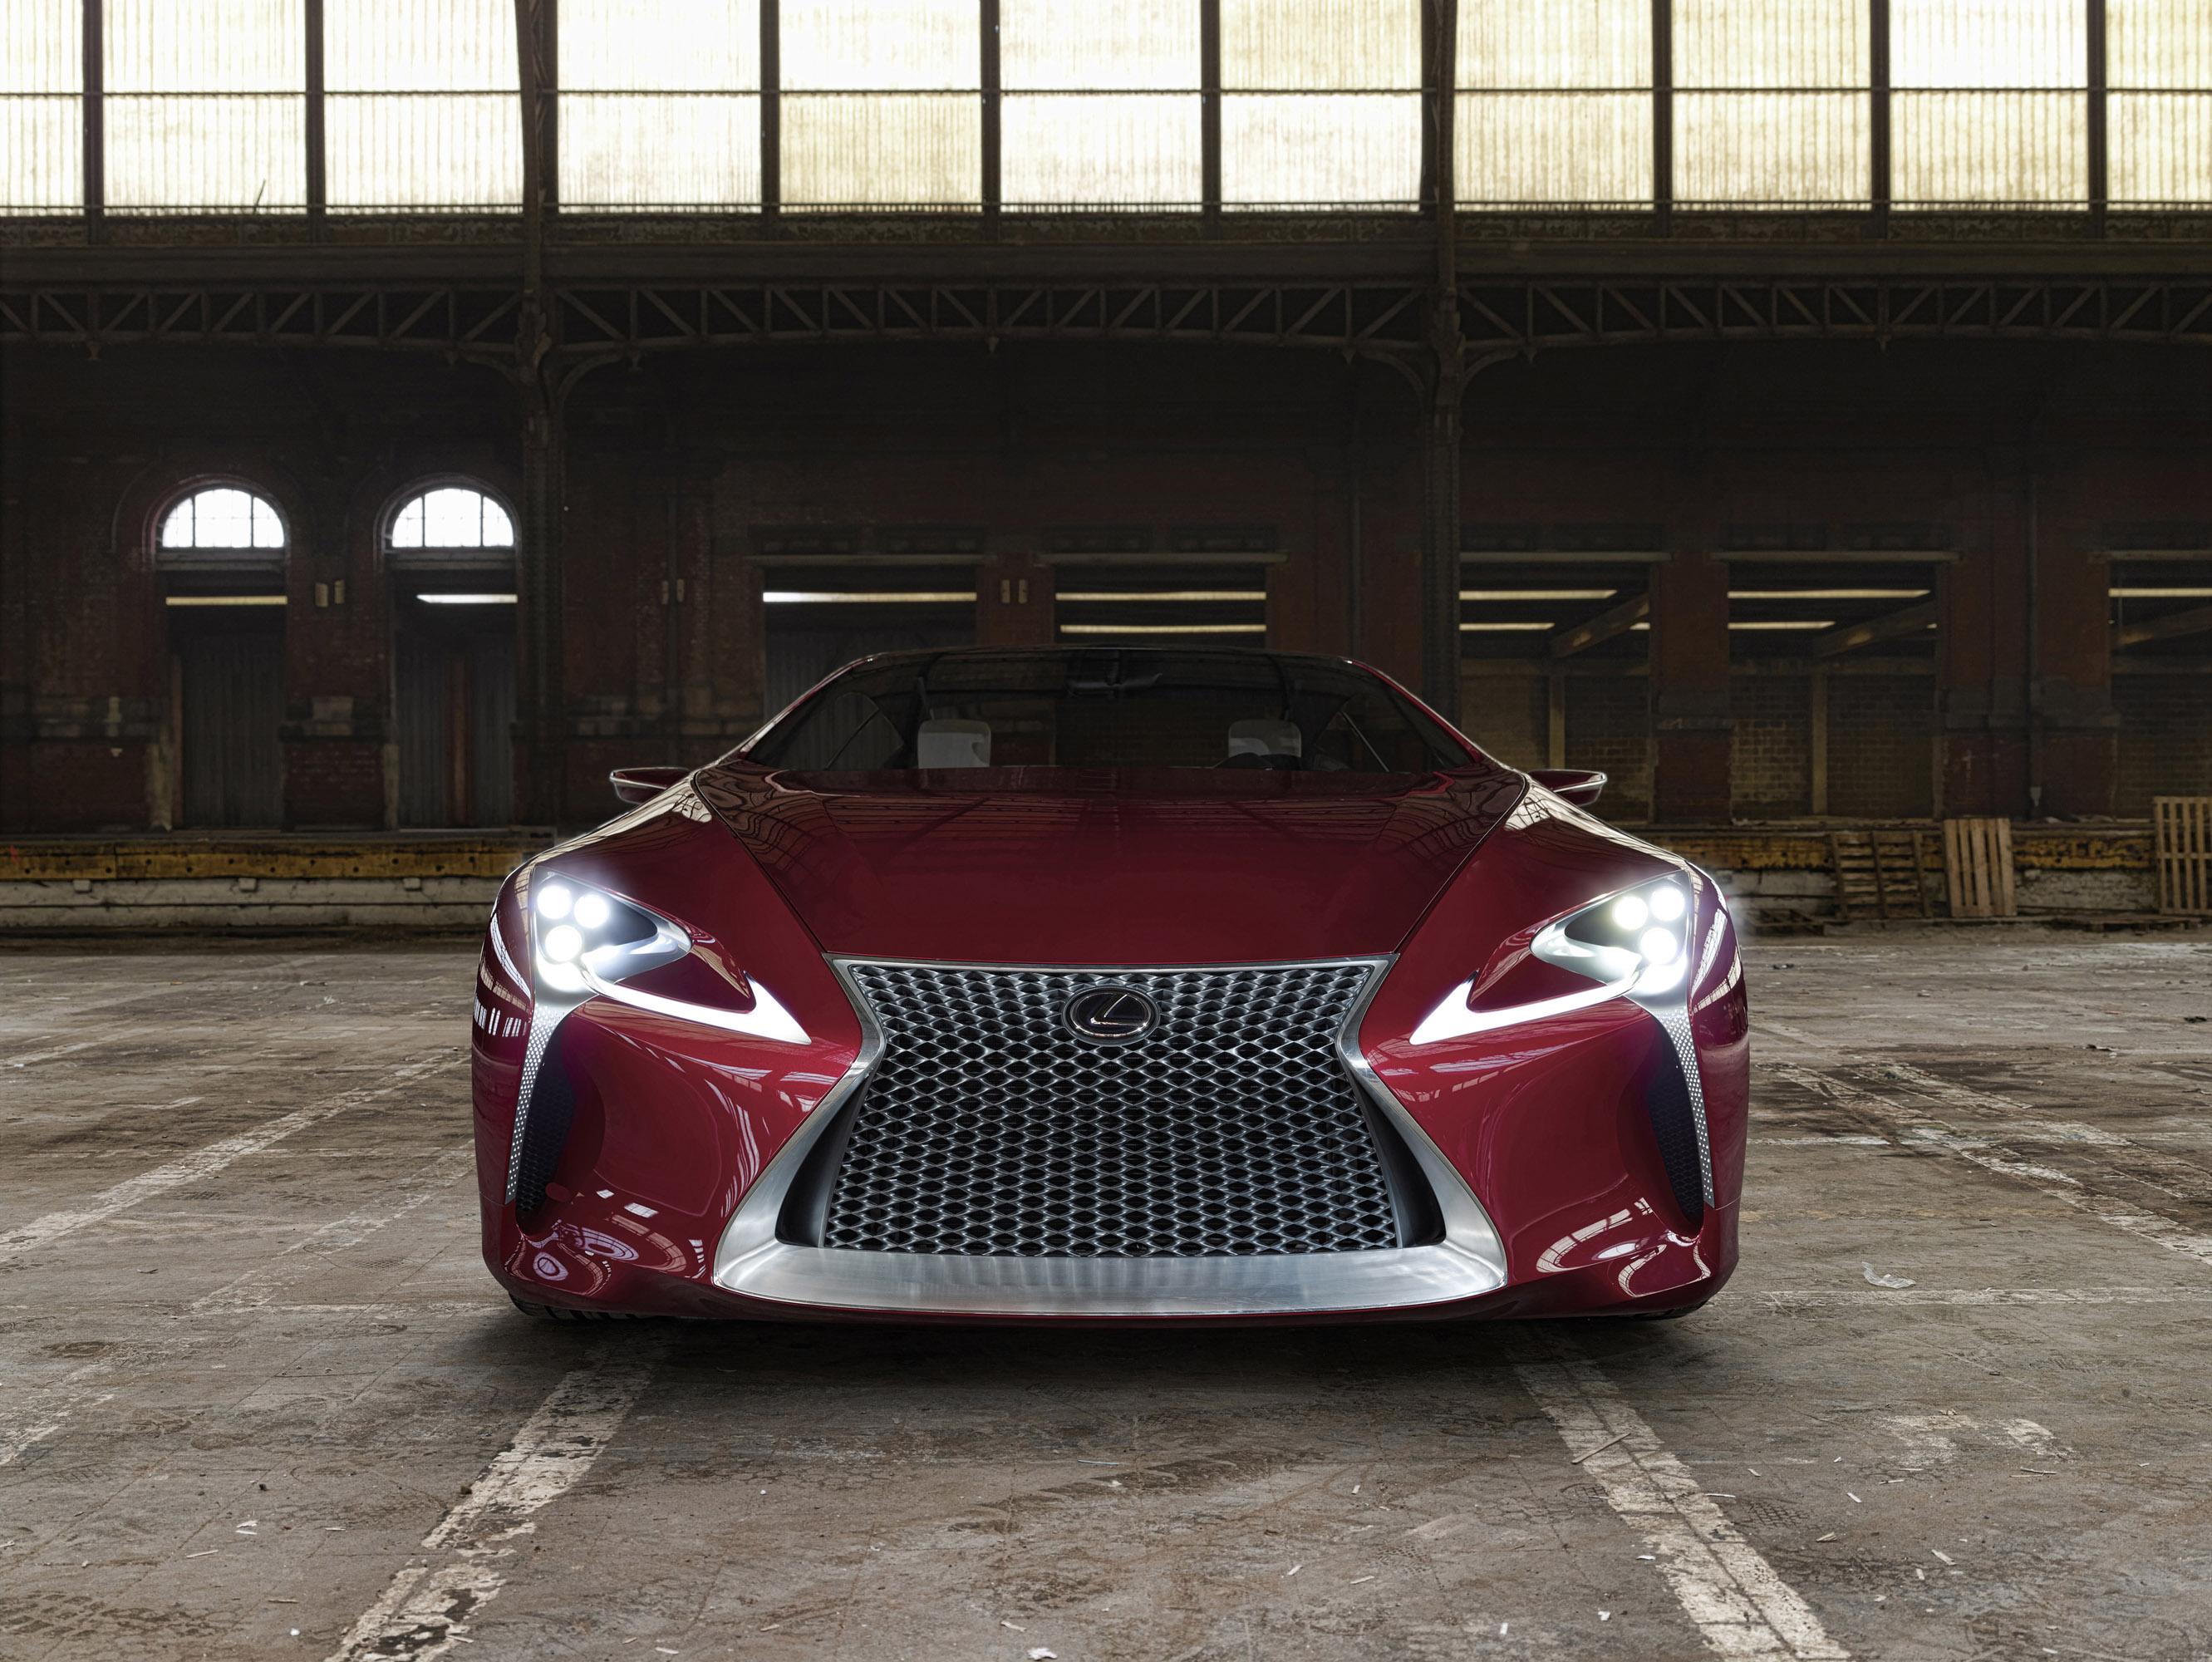 https://www.carsinvasion.com/gallery/2012-lexus-lf-lc-concept/2012-lexus-lf-lc-concept-13.jpg